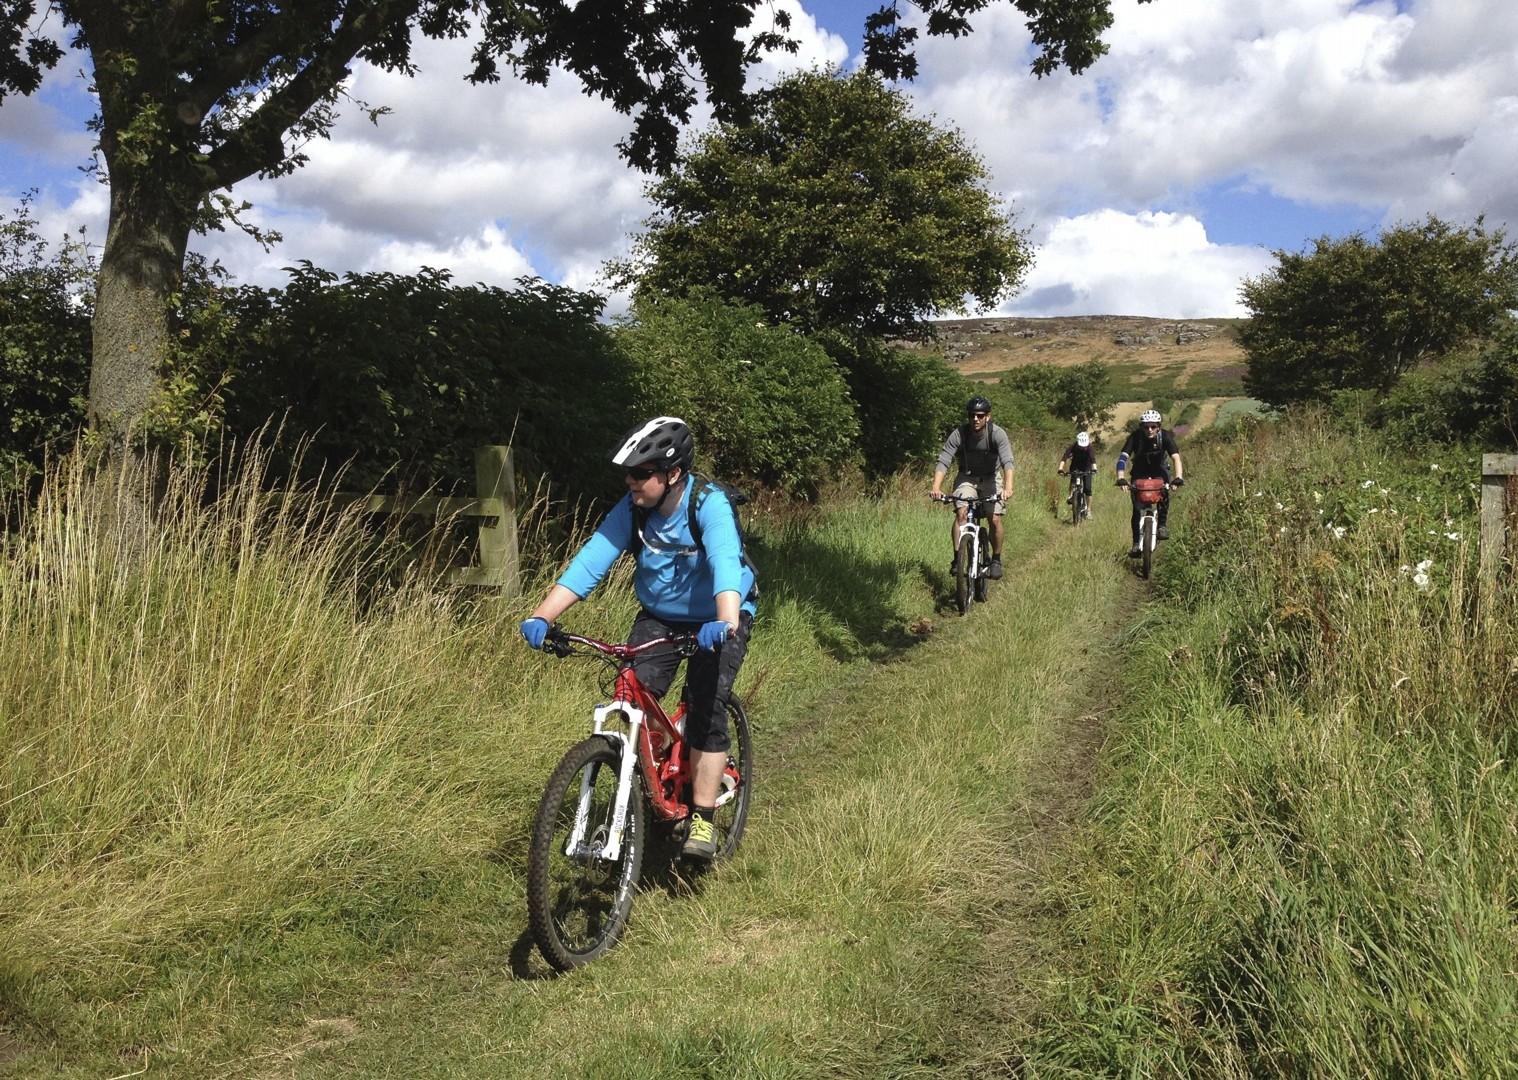 Sandstoneway5.jpg - UK - Northumberland - Sandstone Way - Self-Guided Mountain Bike Weekend - Mountain Biking